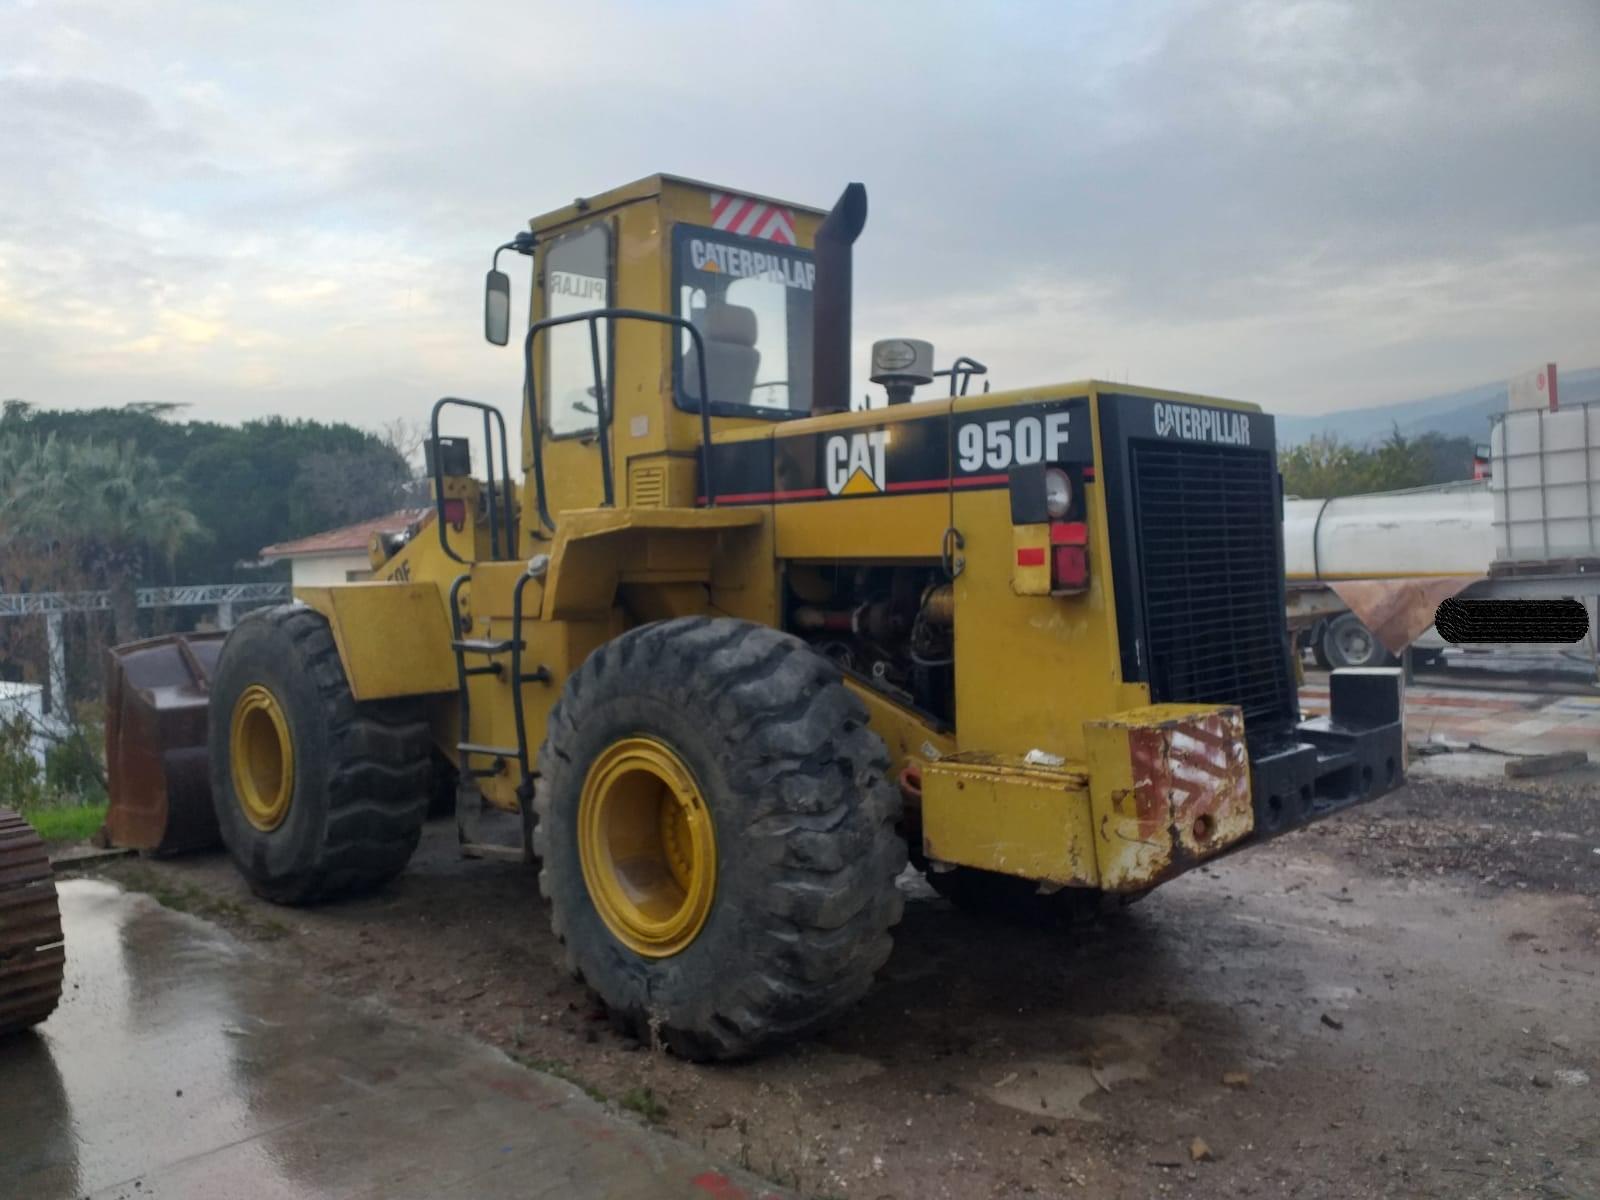 Caterpillar 950F Wheelloader